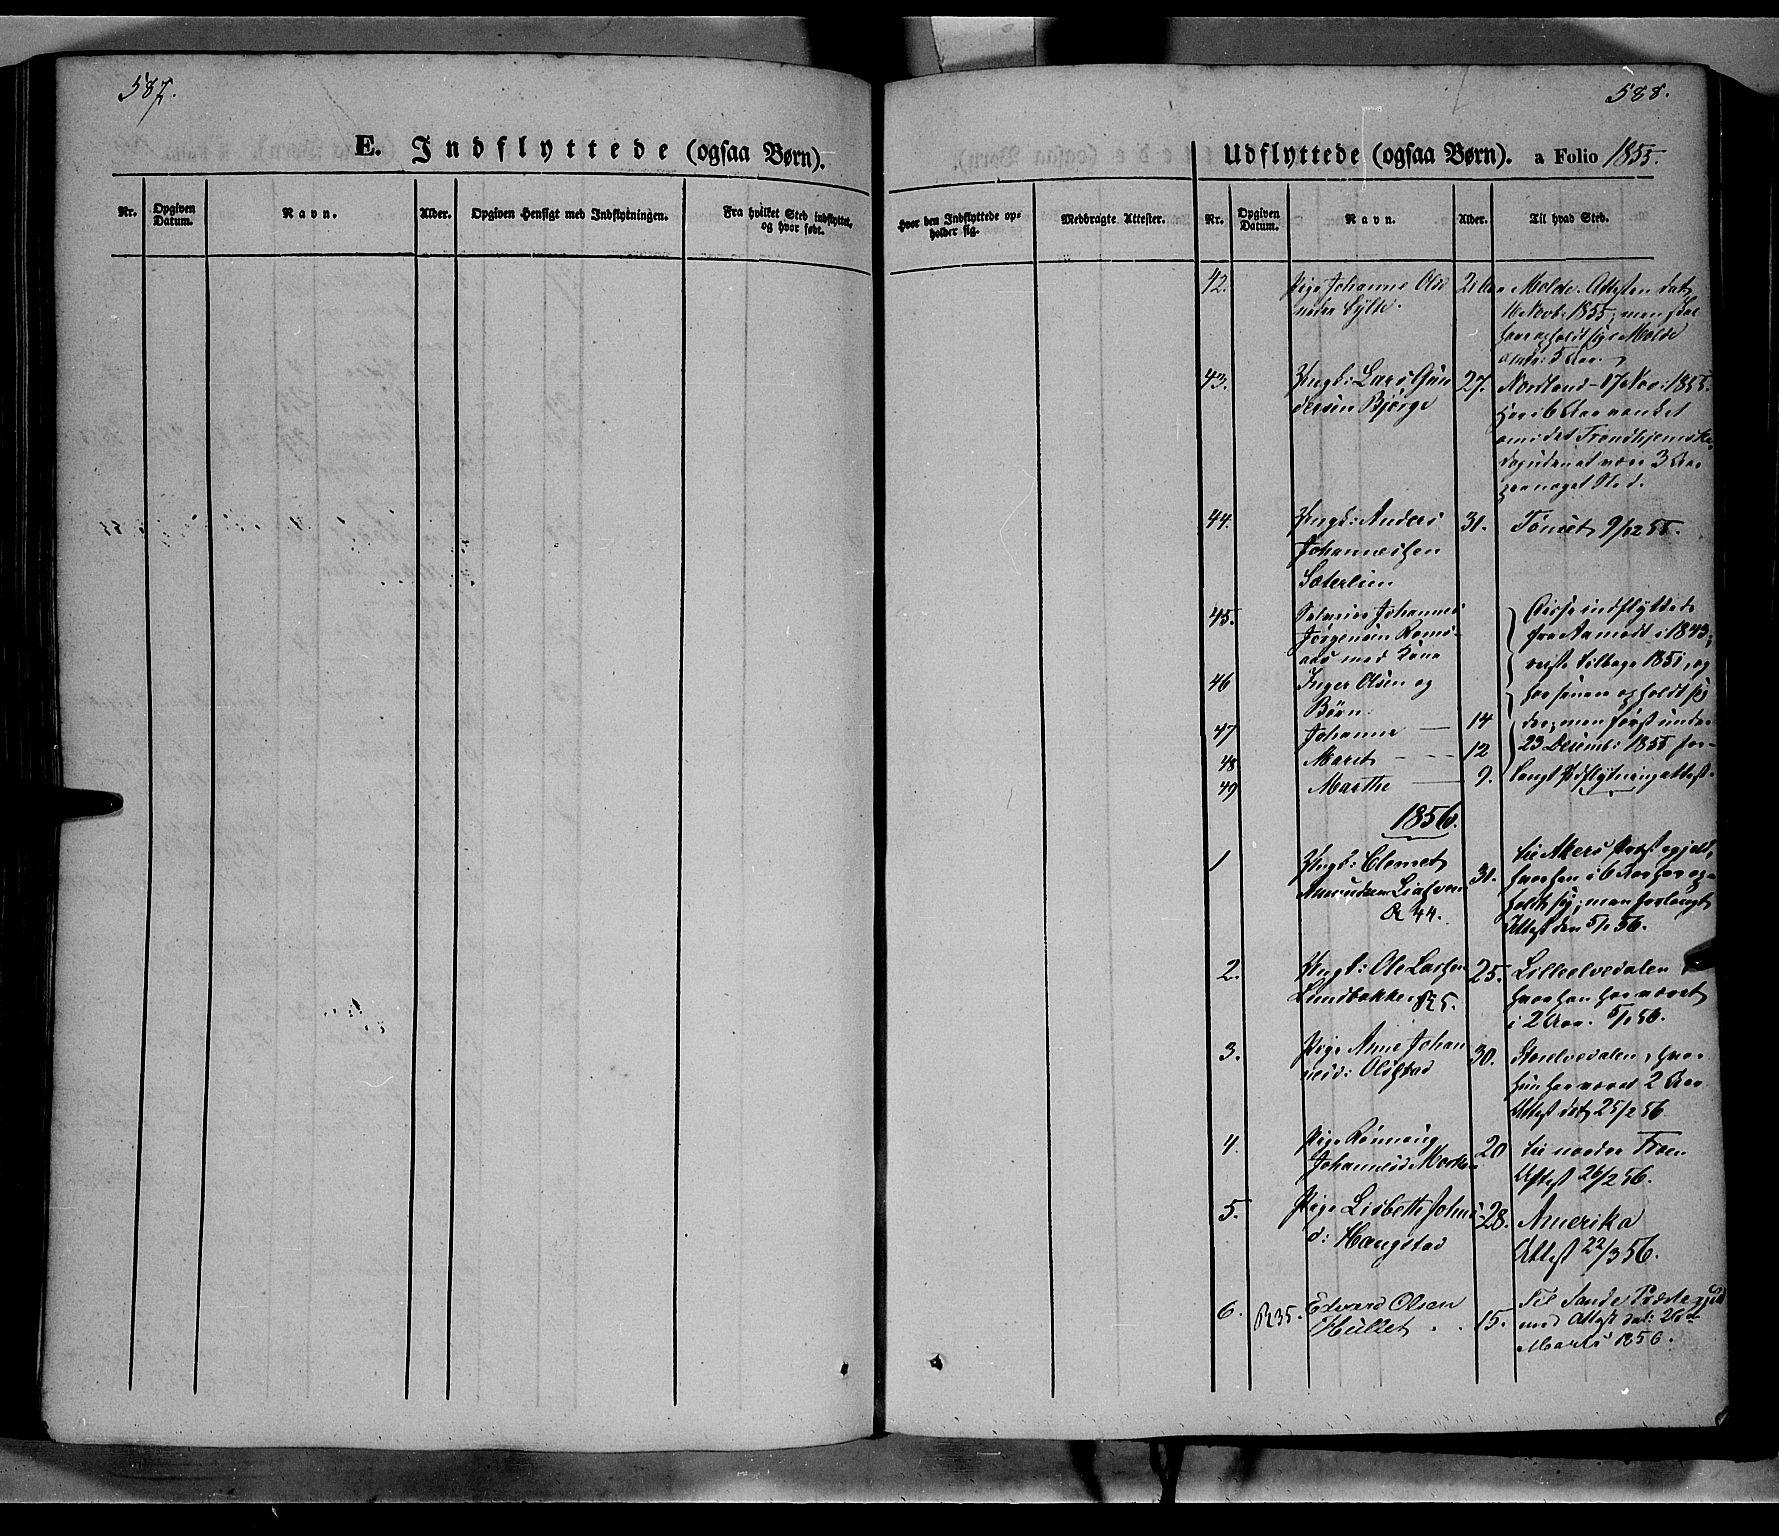 SAH, Ringebu prestekontor, Ministerialbok nr. 6, 1848-1859, s. 587-588